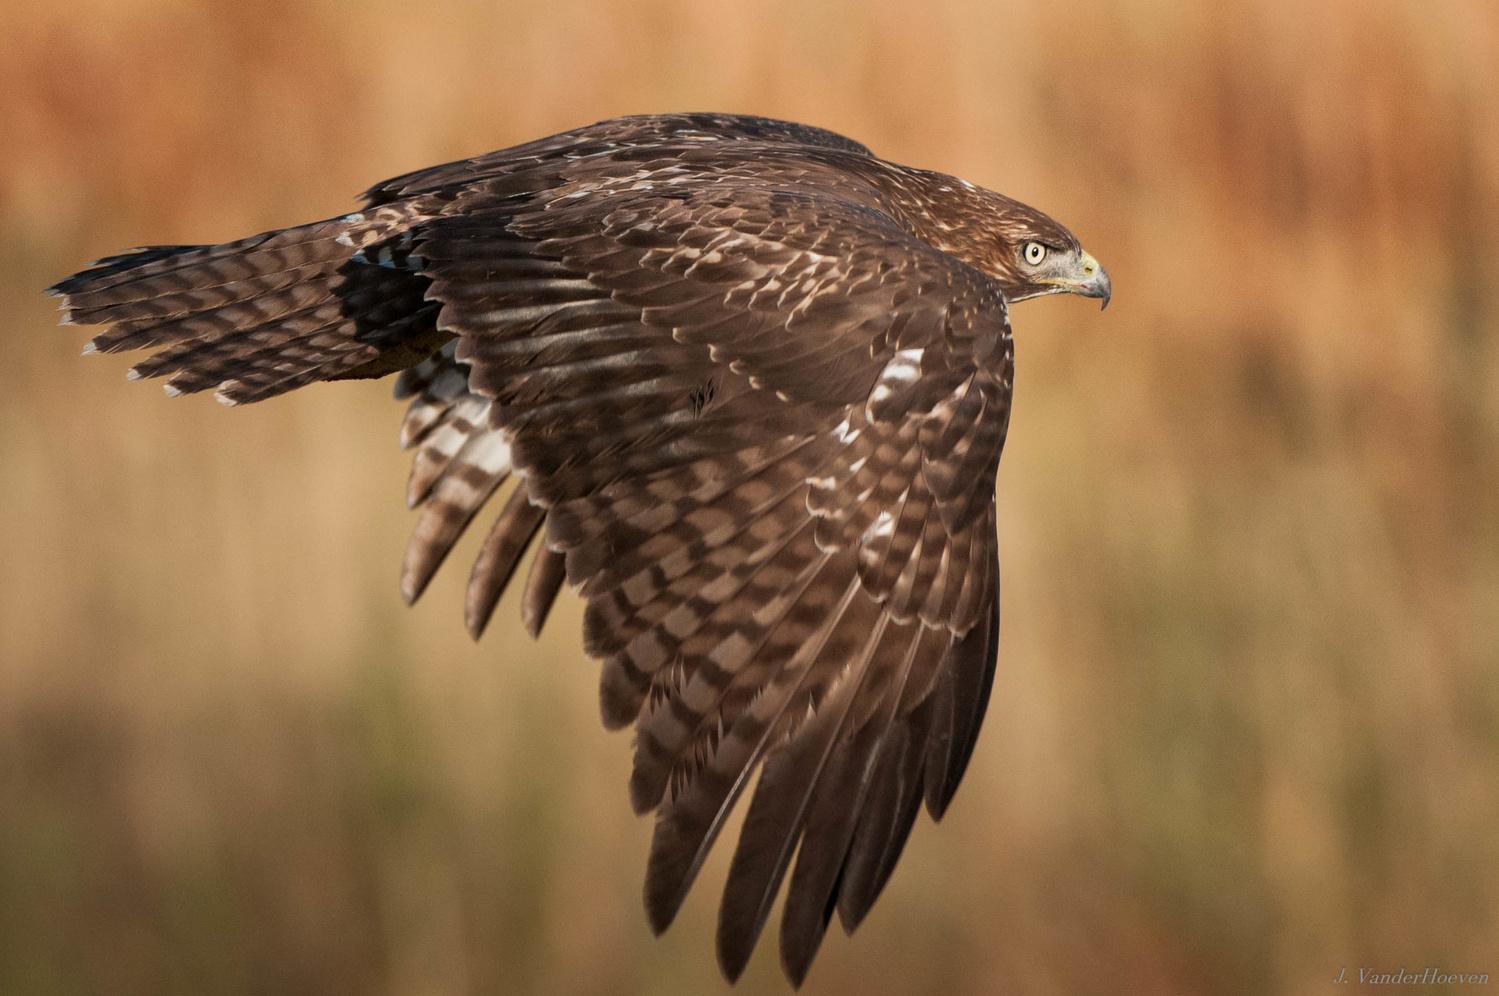 Flight - Coopers Hawk by Jake VanderHoeven